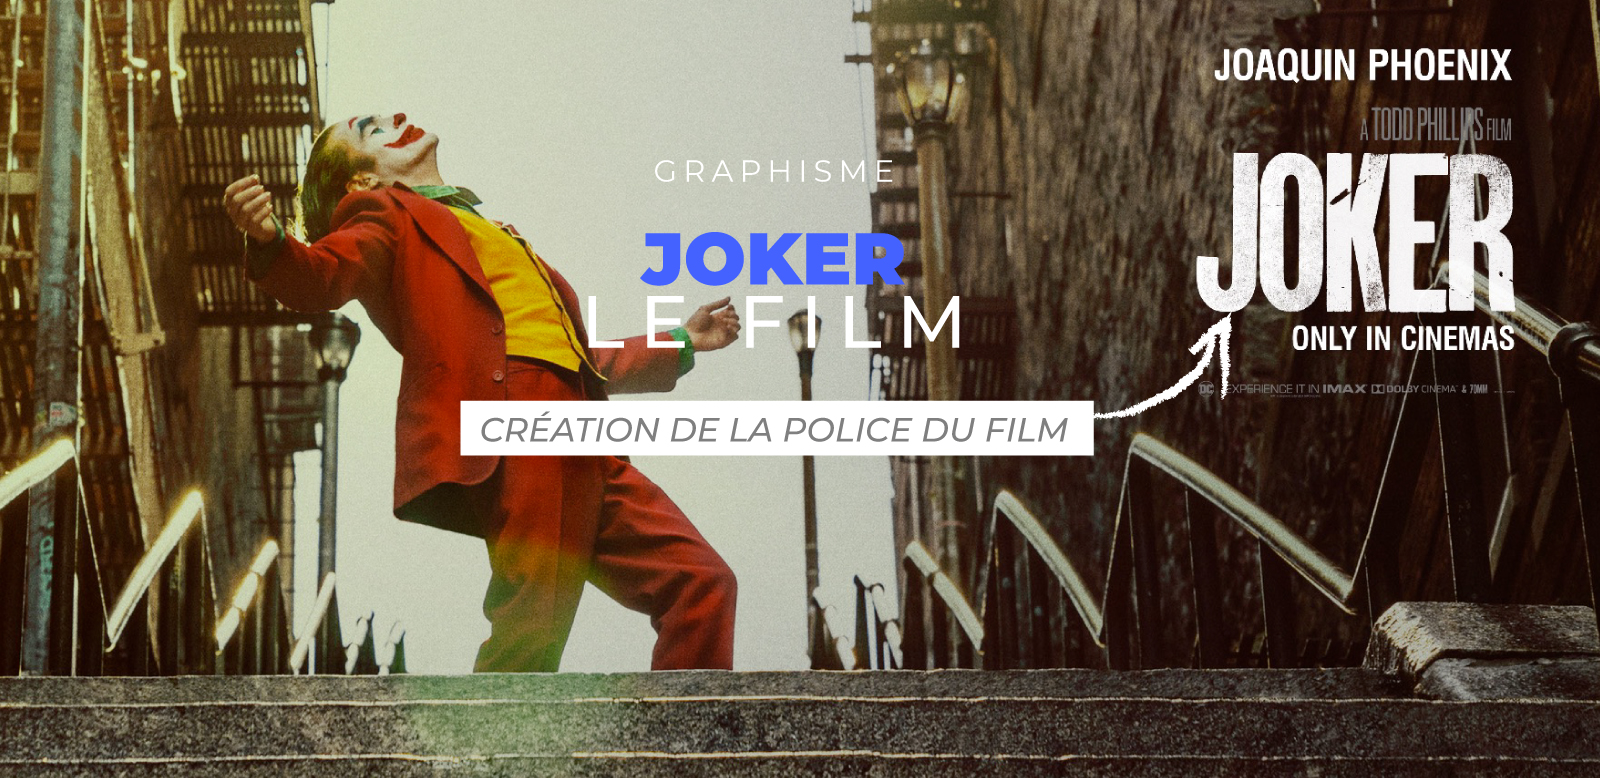 typographie-film-joker-graphisme